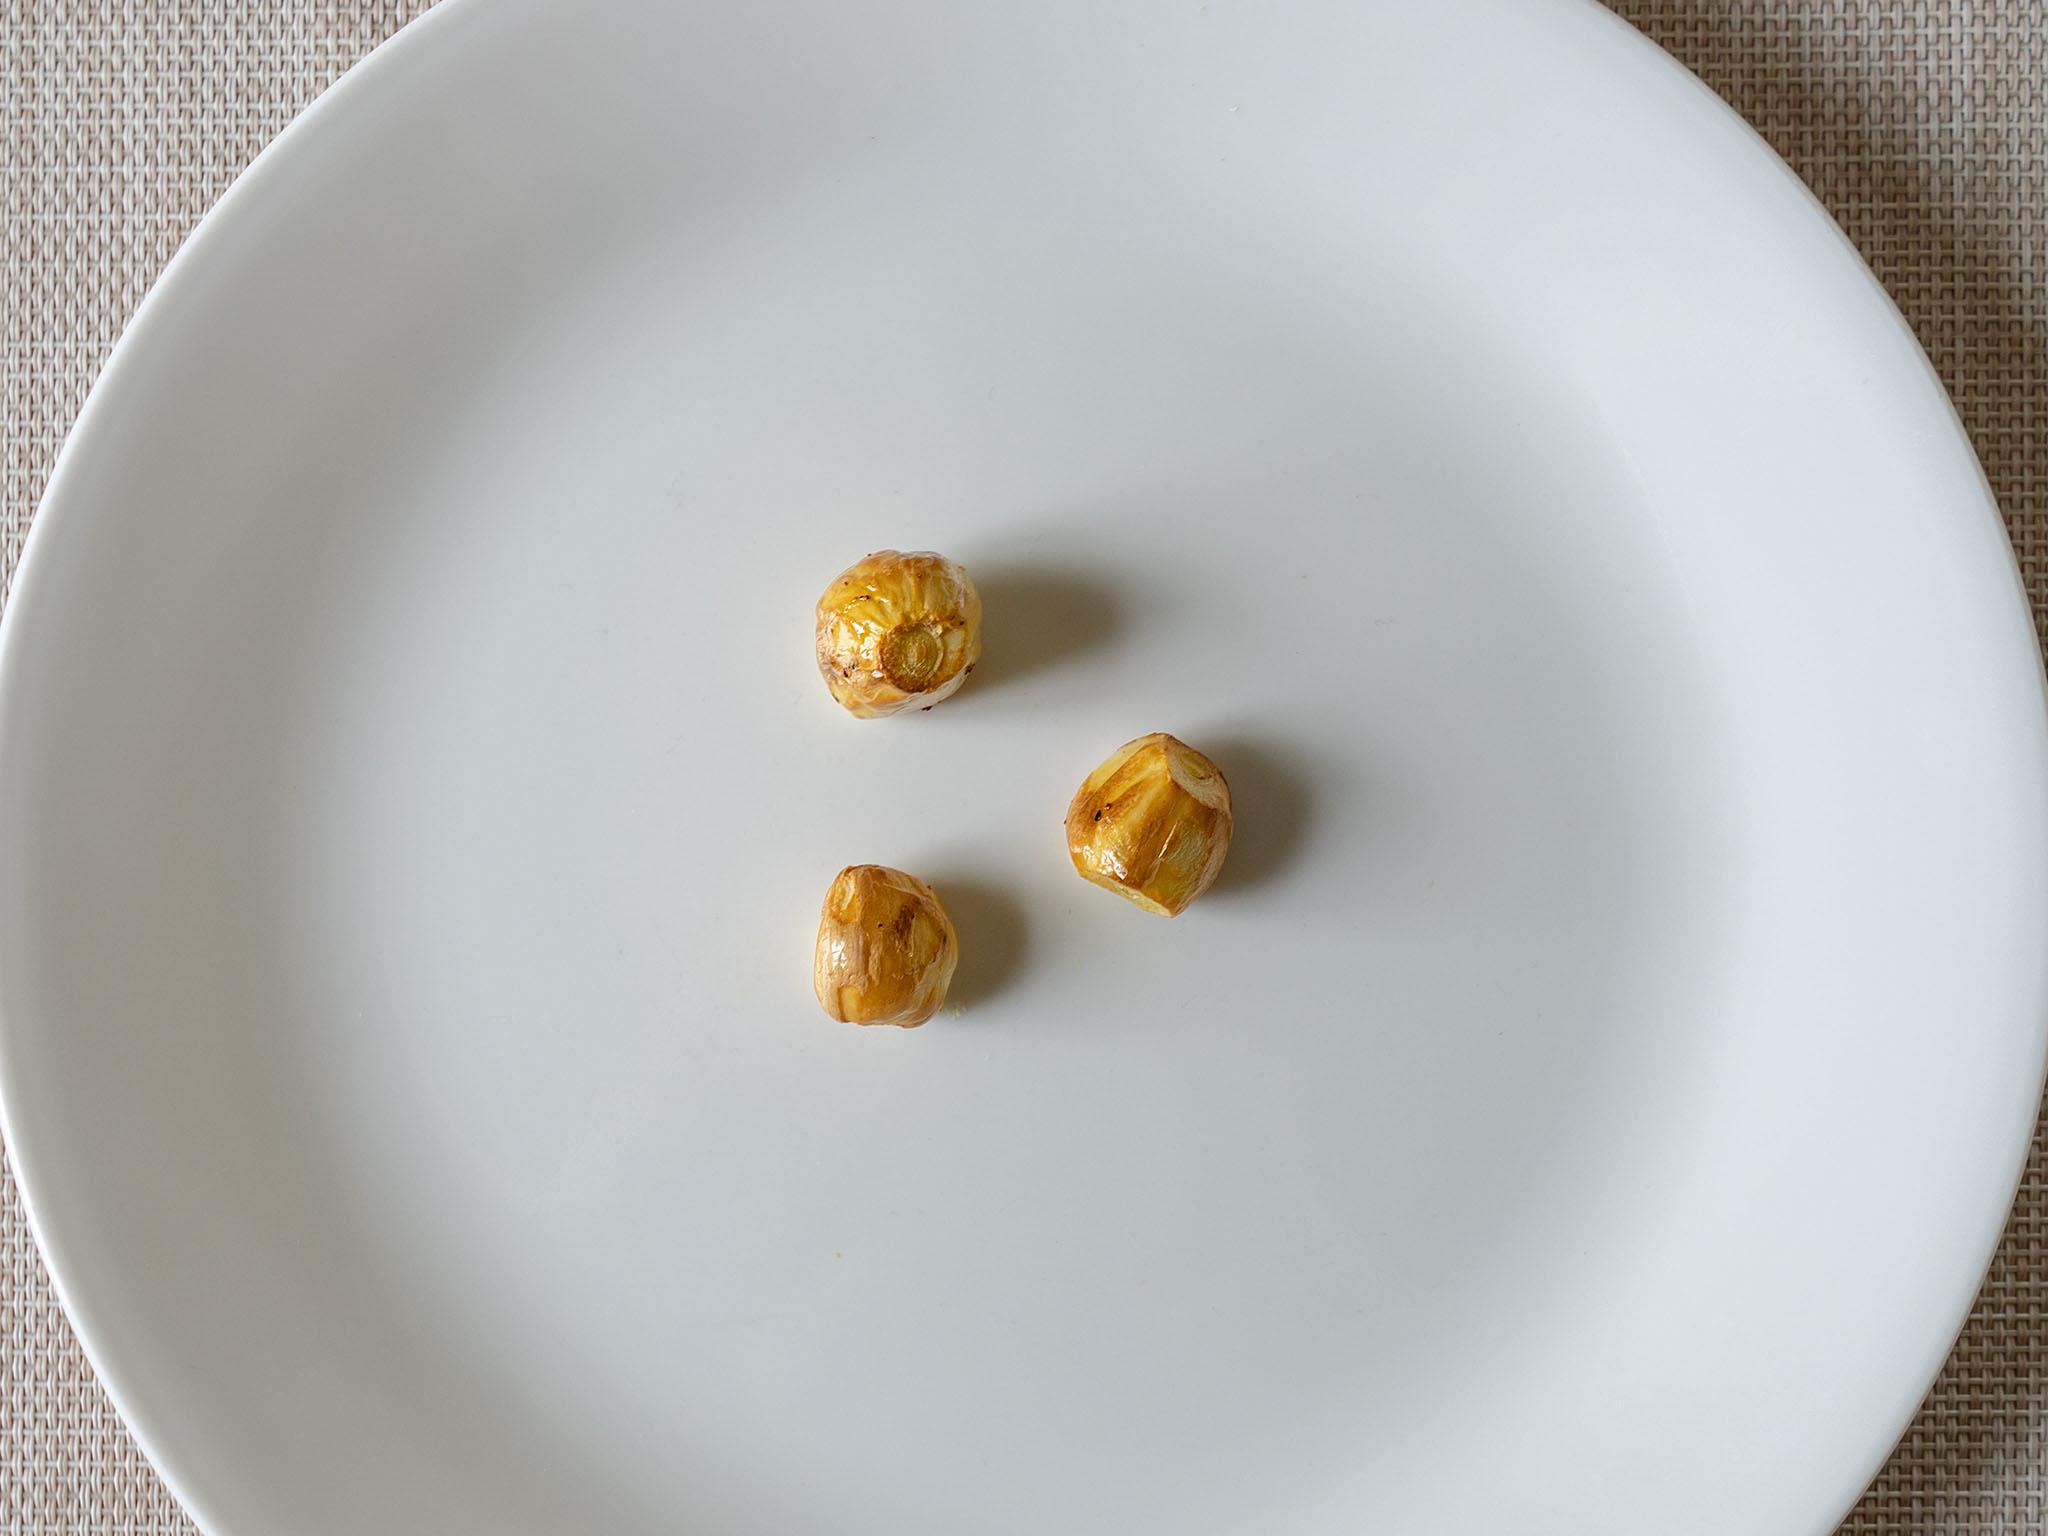 Air fried roasted garlic